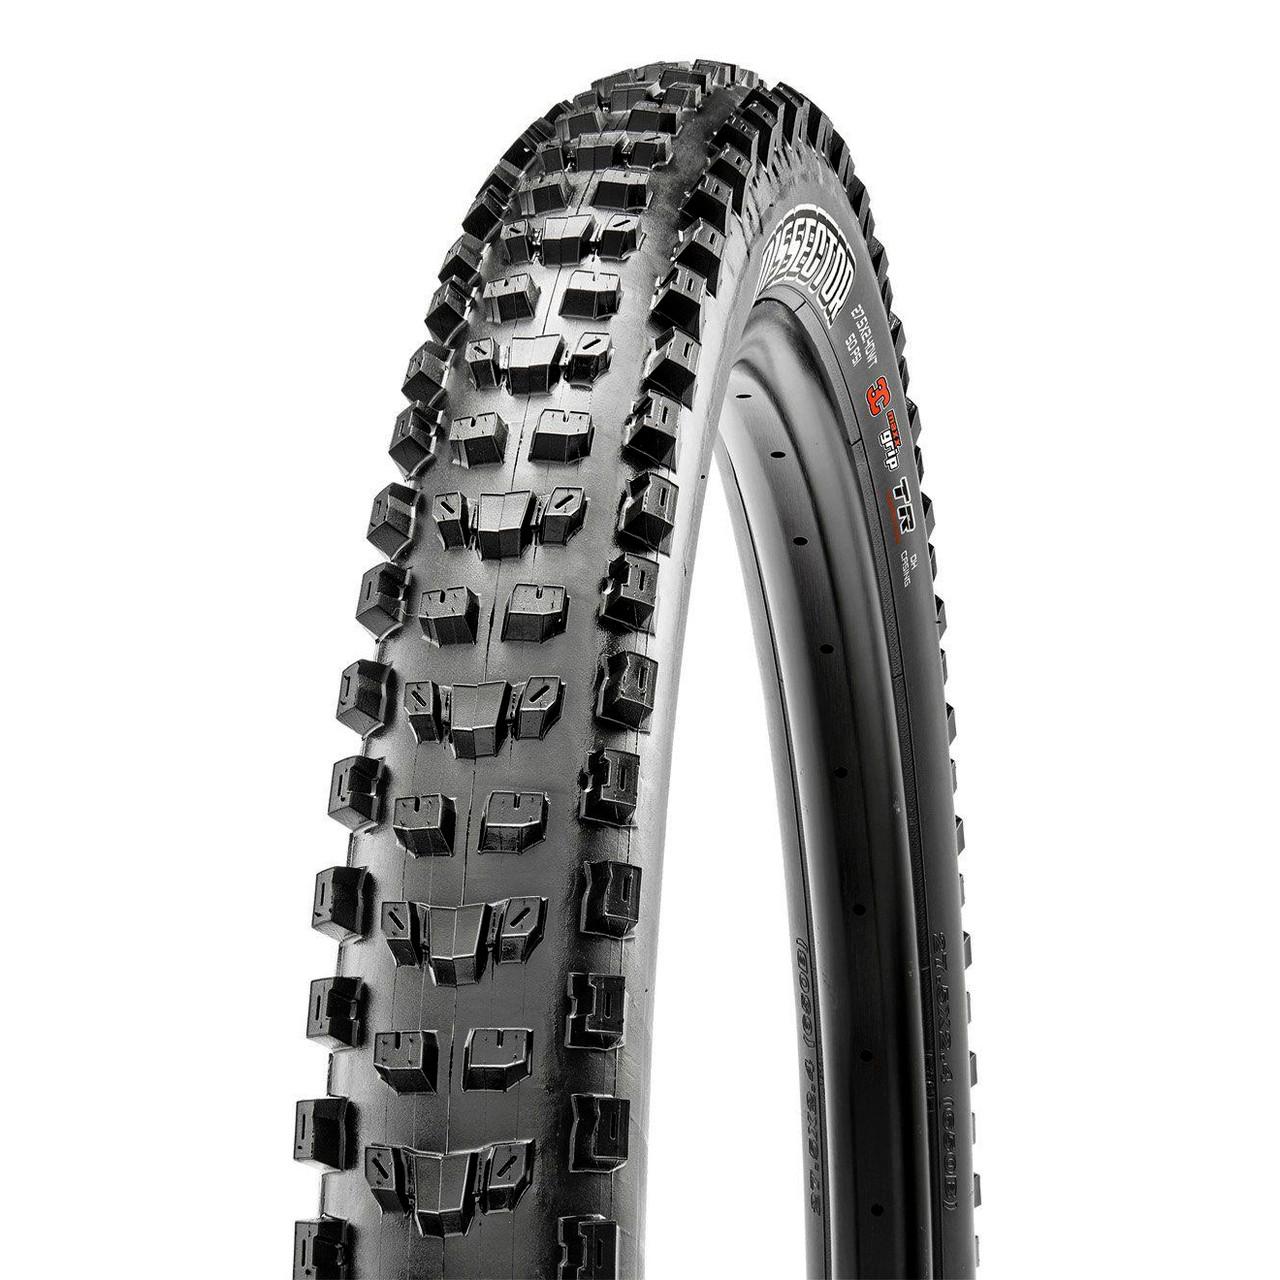 "Покрышка велосипедная Maxxis Dissector 29x2.4"" WT (складная, фолдинг) 3С/EXO/TR (Tubeless Ready)"